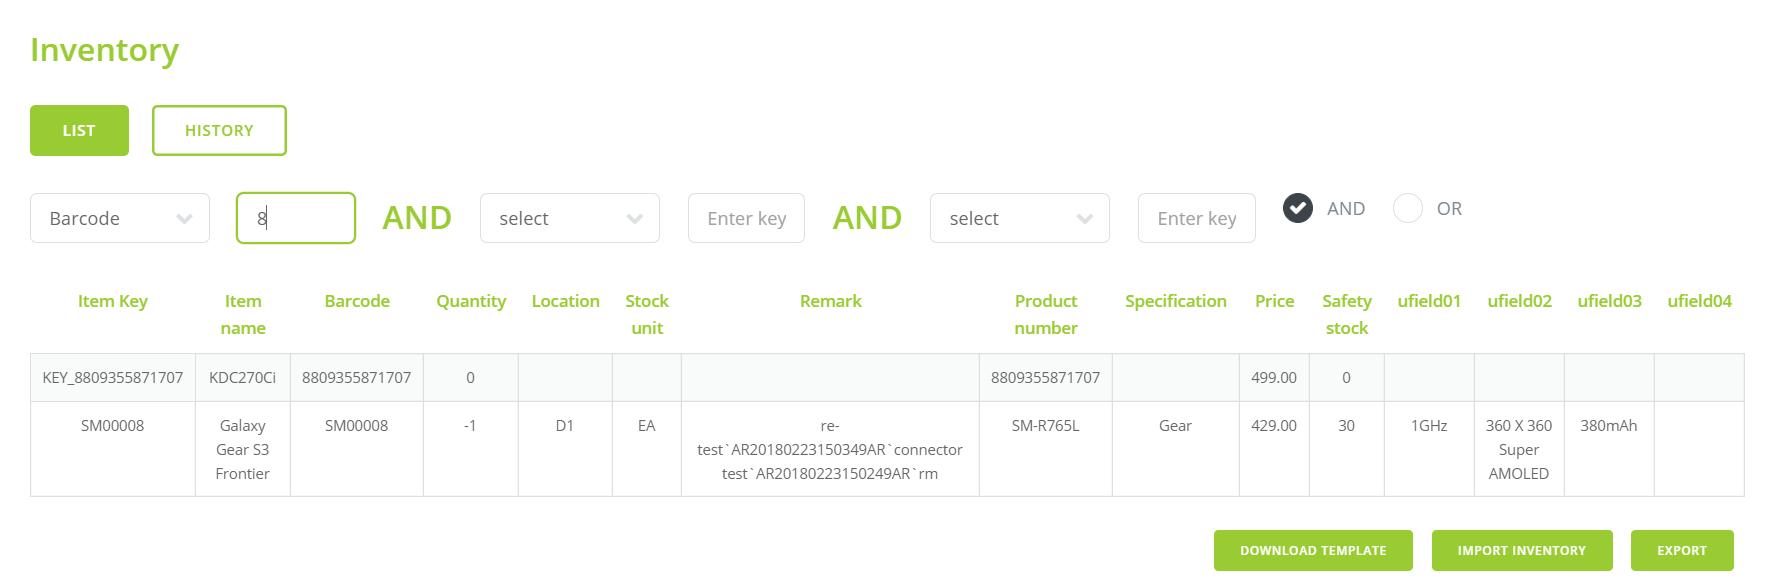 Inventory App Admin in KOAMTACON by KOAMTAC